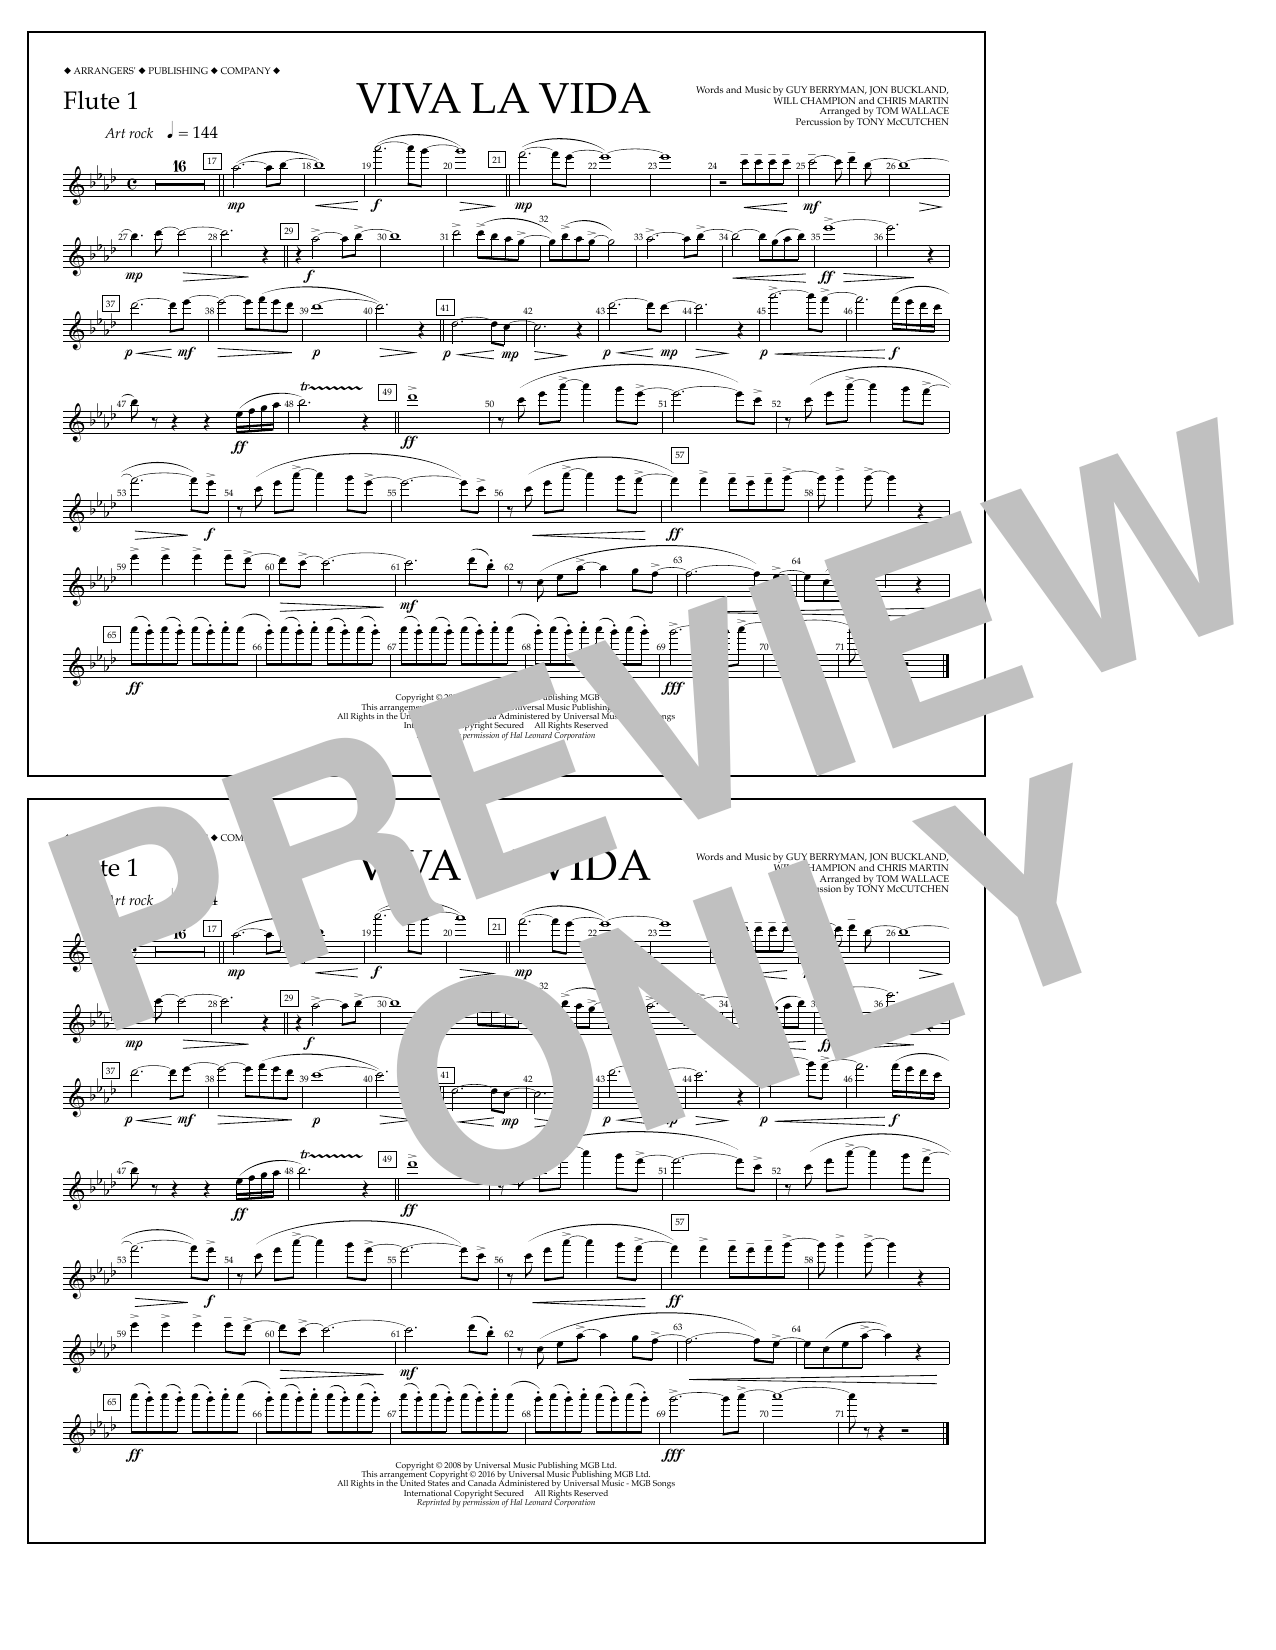 Tom Wallace Viva La Vida - Flute 1 sheet music notes and chords. Download Printable PDF.